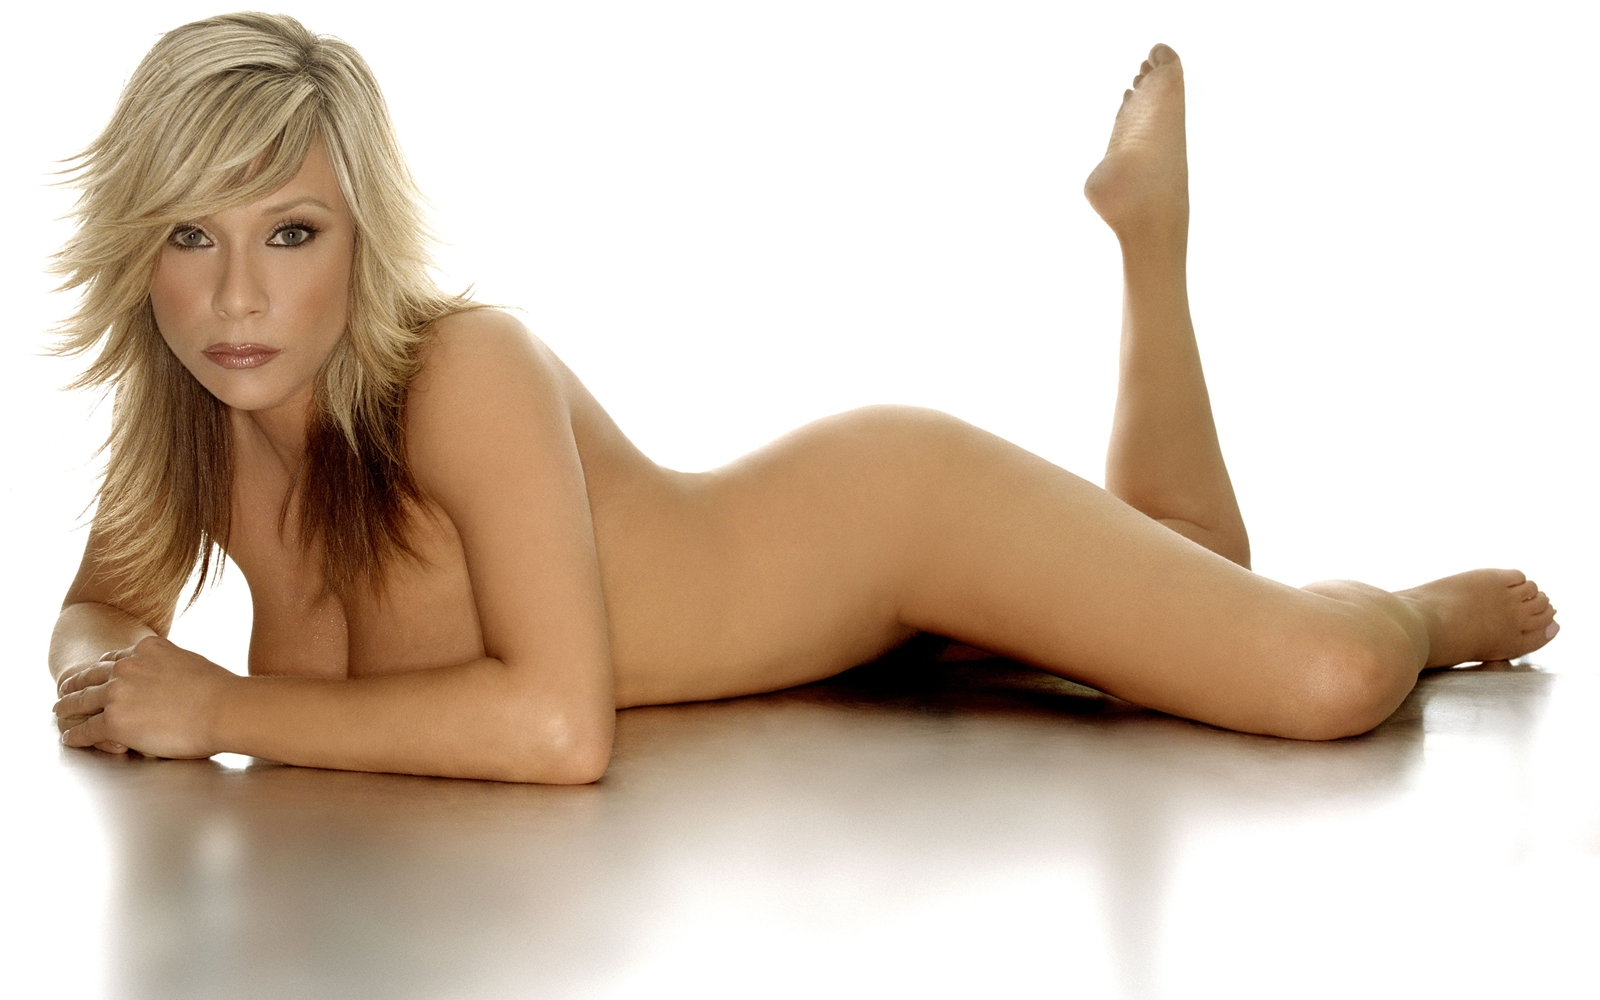 nude photos of wwe divas